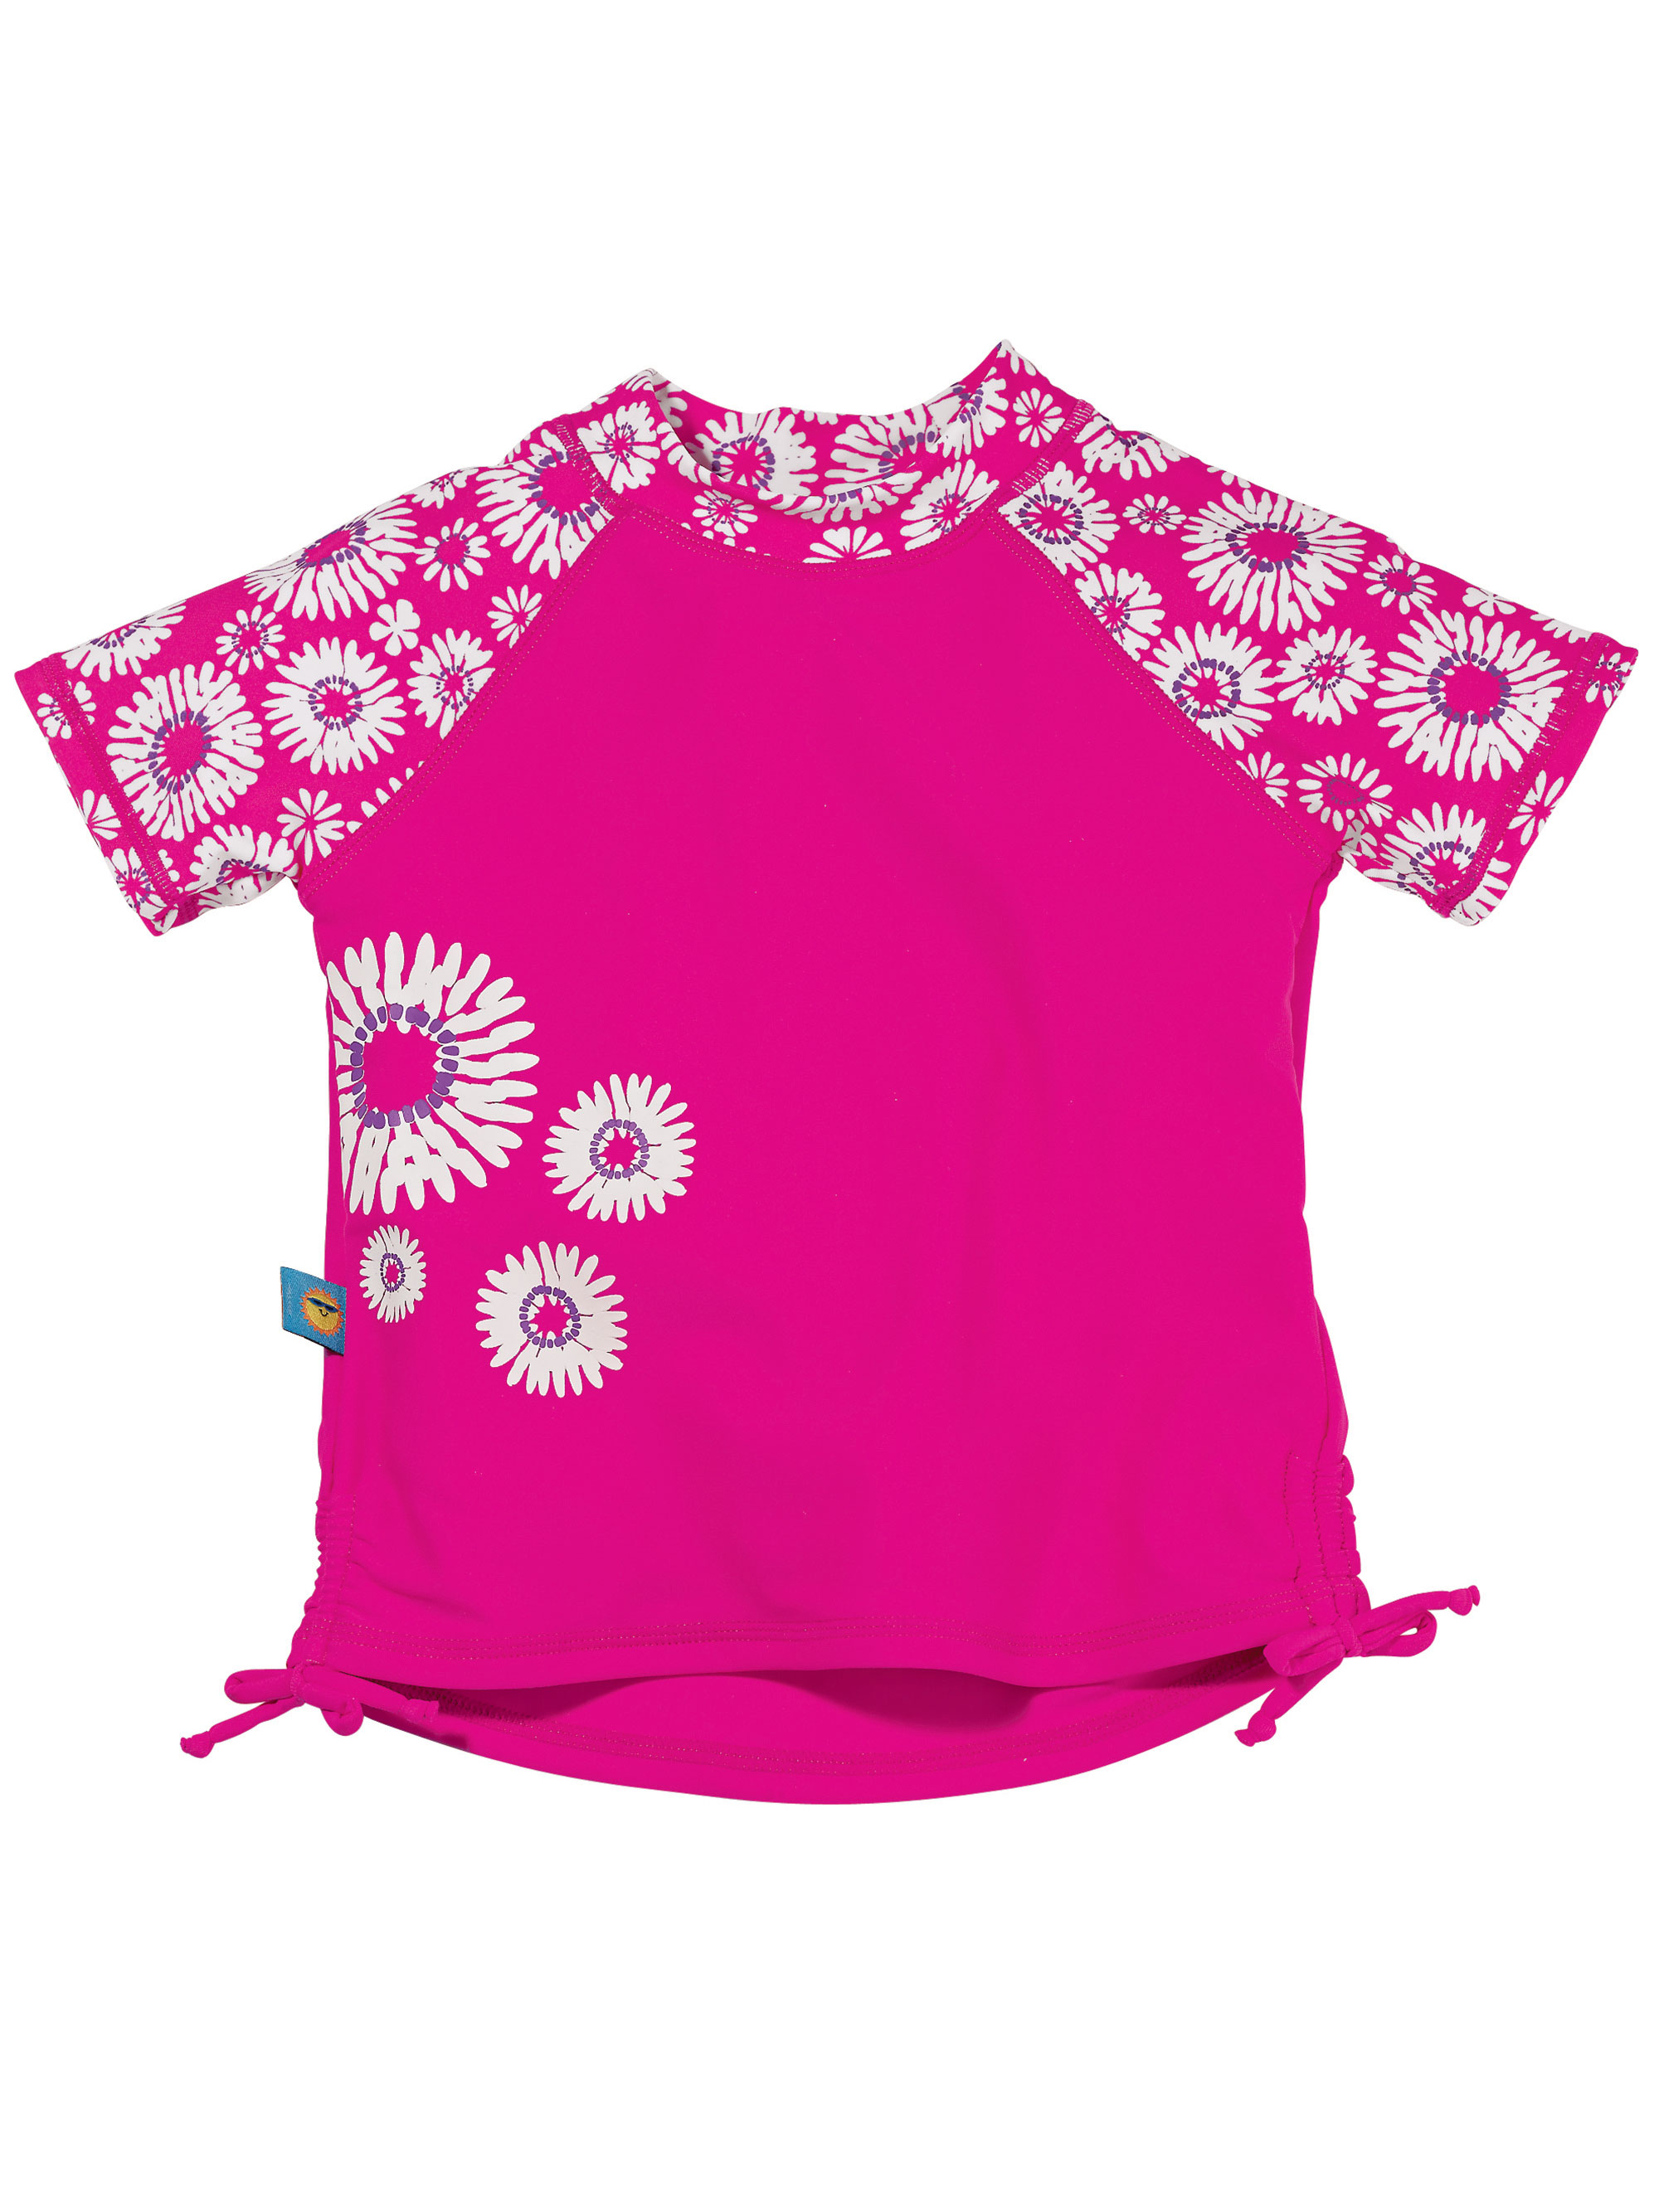 Sun Smarties Baby Girl Rashguard - Hot Pink Fuchsia Floral Design - UPF 50+ Short Sleeve Sun Protection